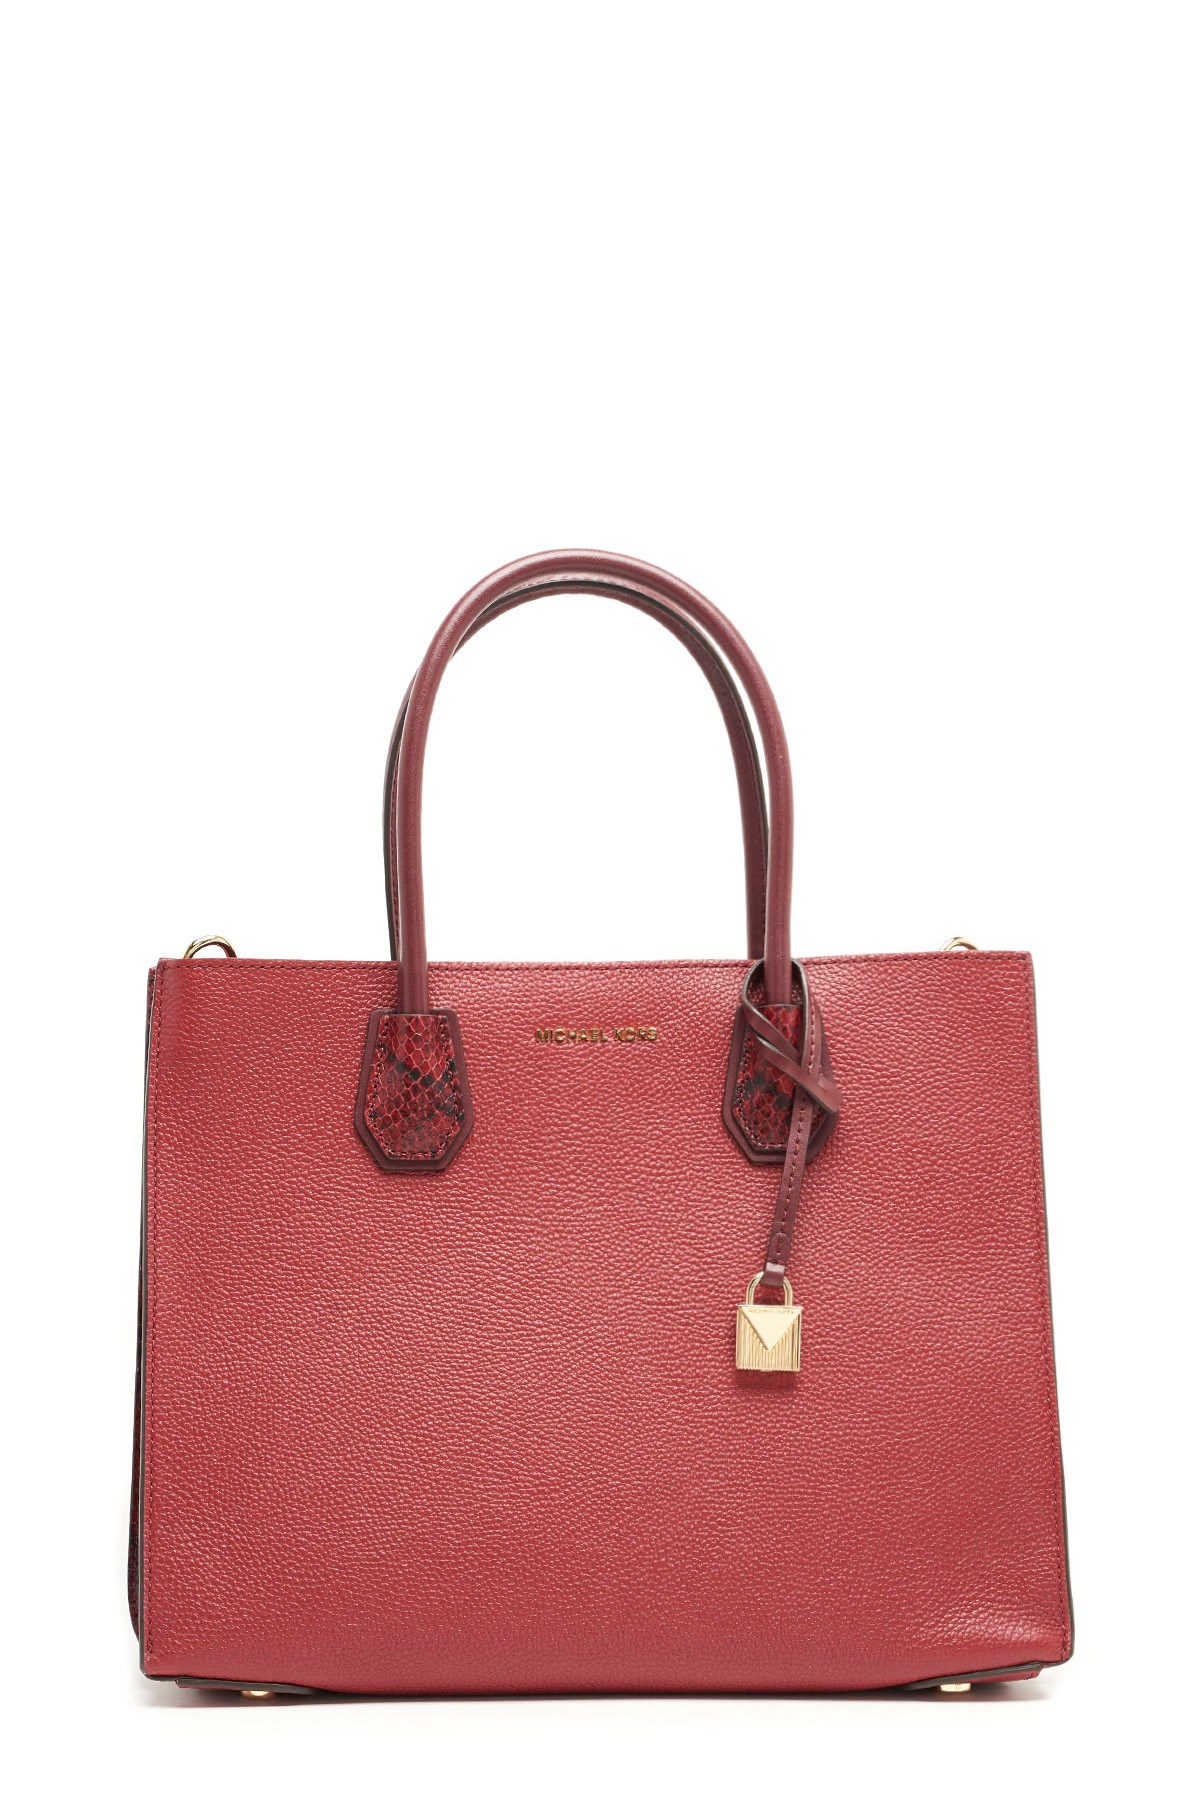 16d67f225598 michael michael kors 'mercer' hand bag available on julian-fashion ...